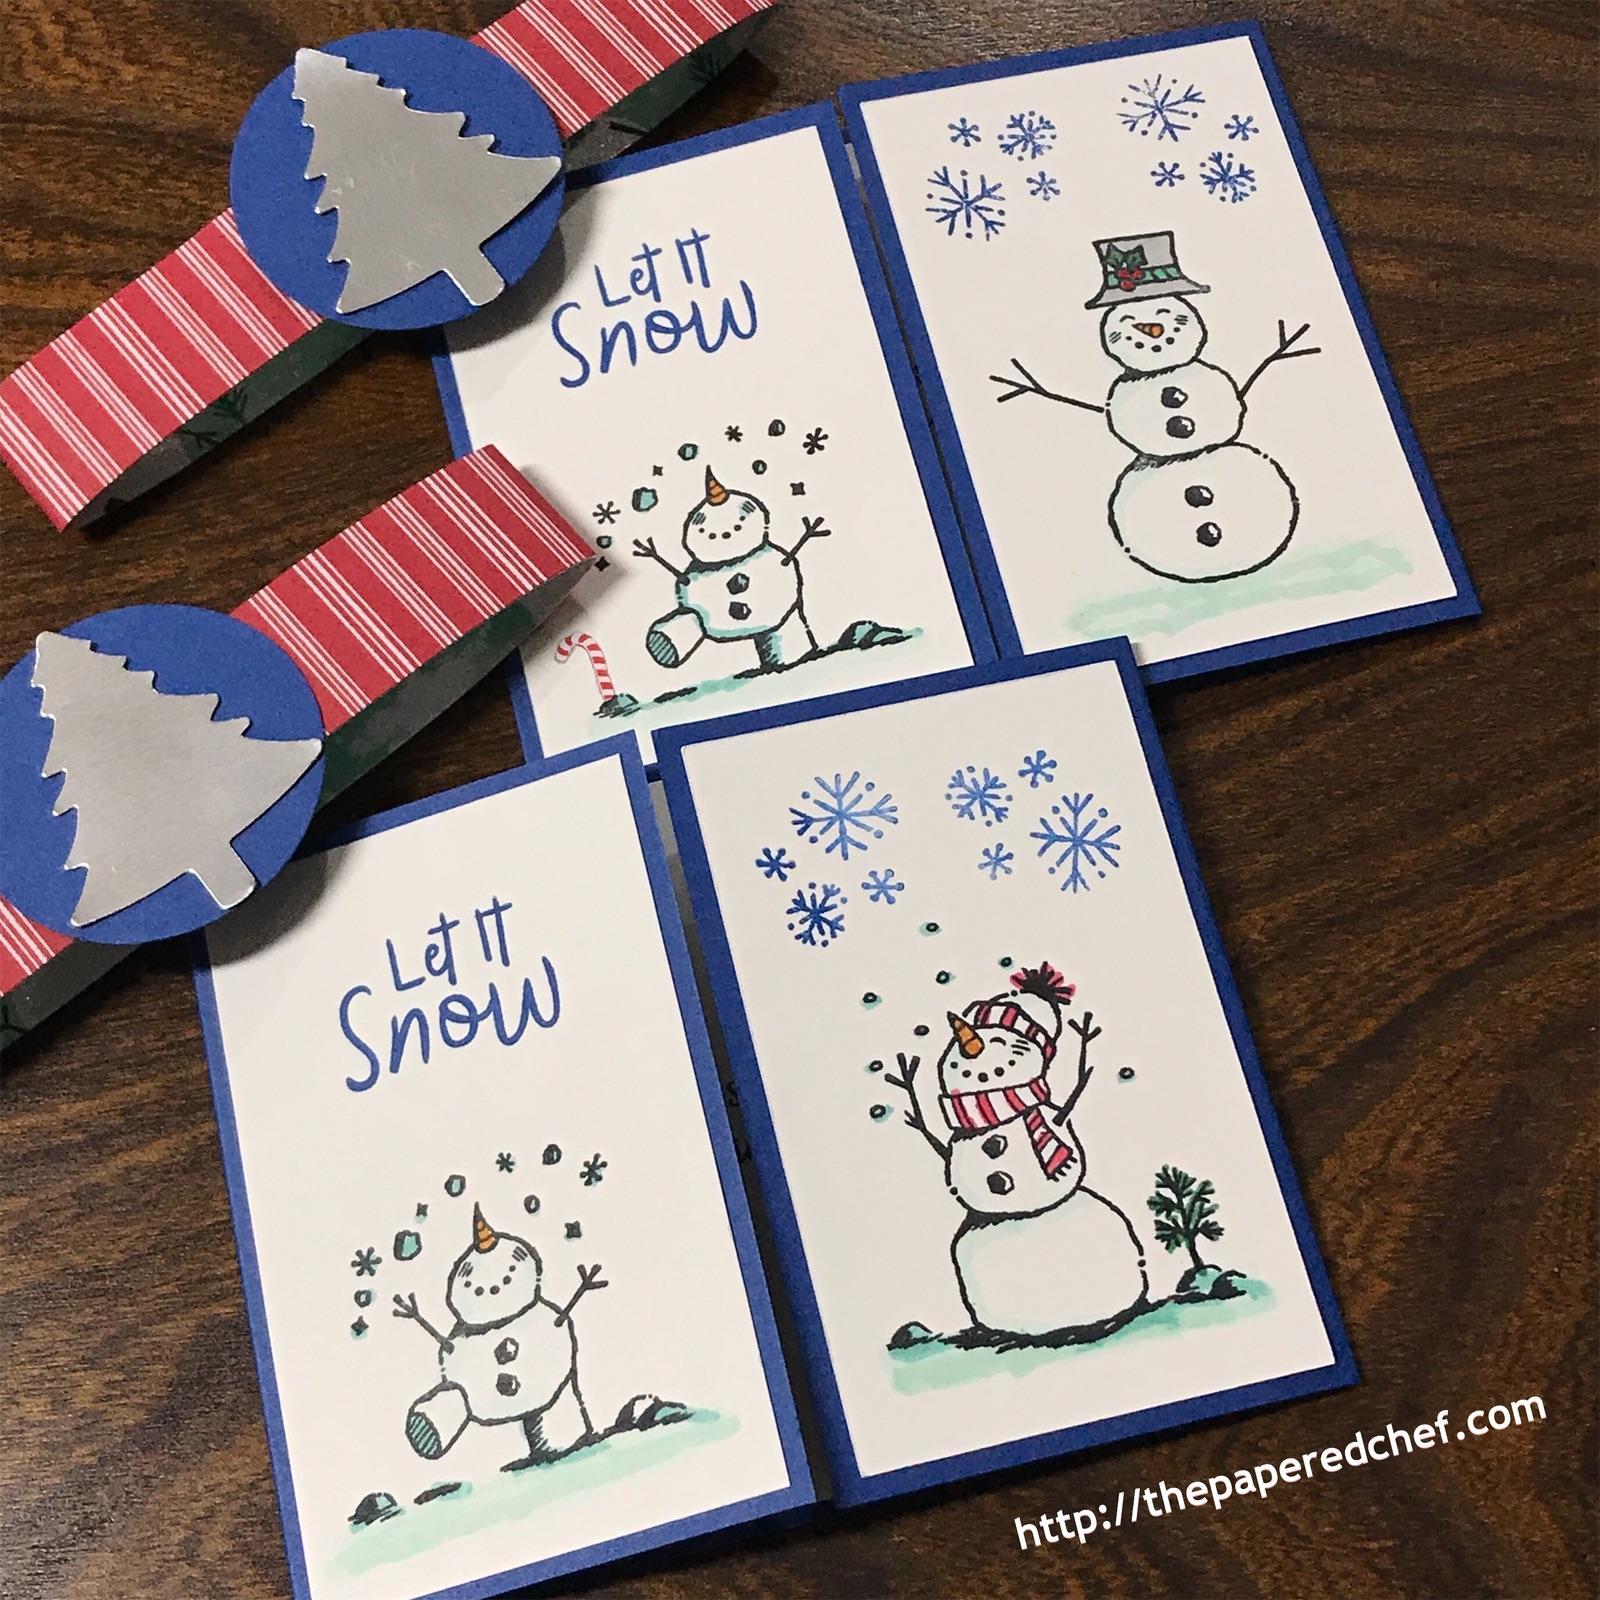 Snowman Season - Let it Snow - Card